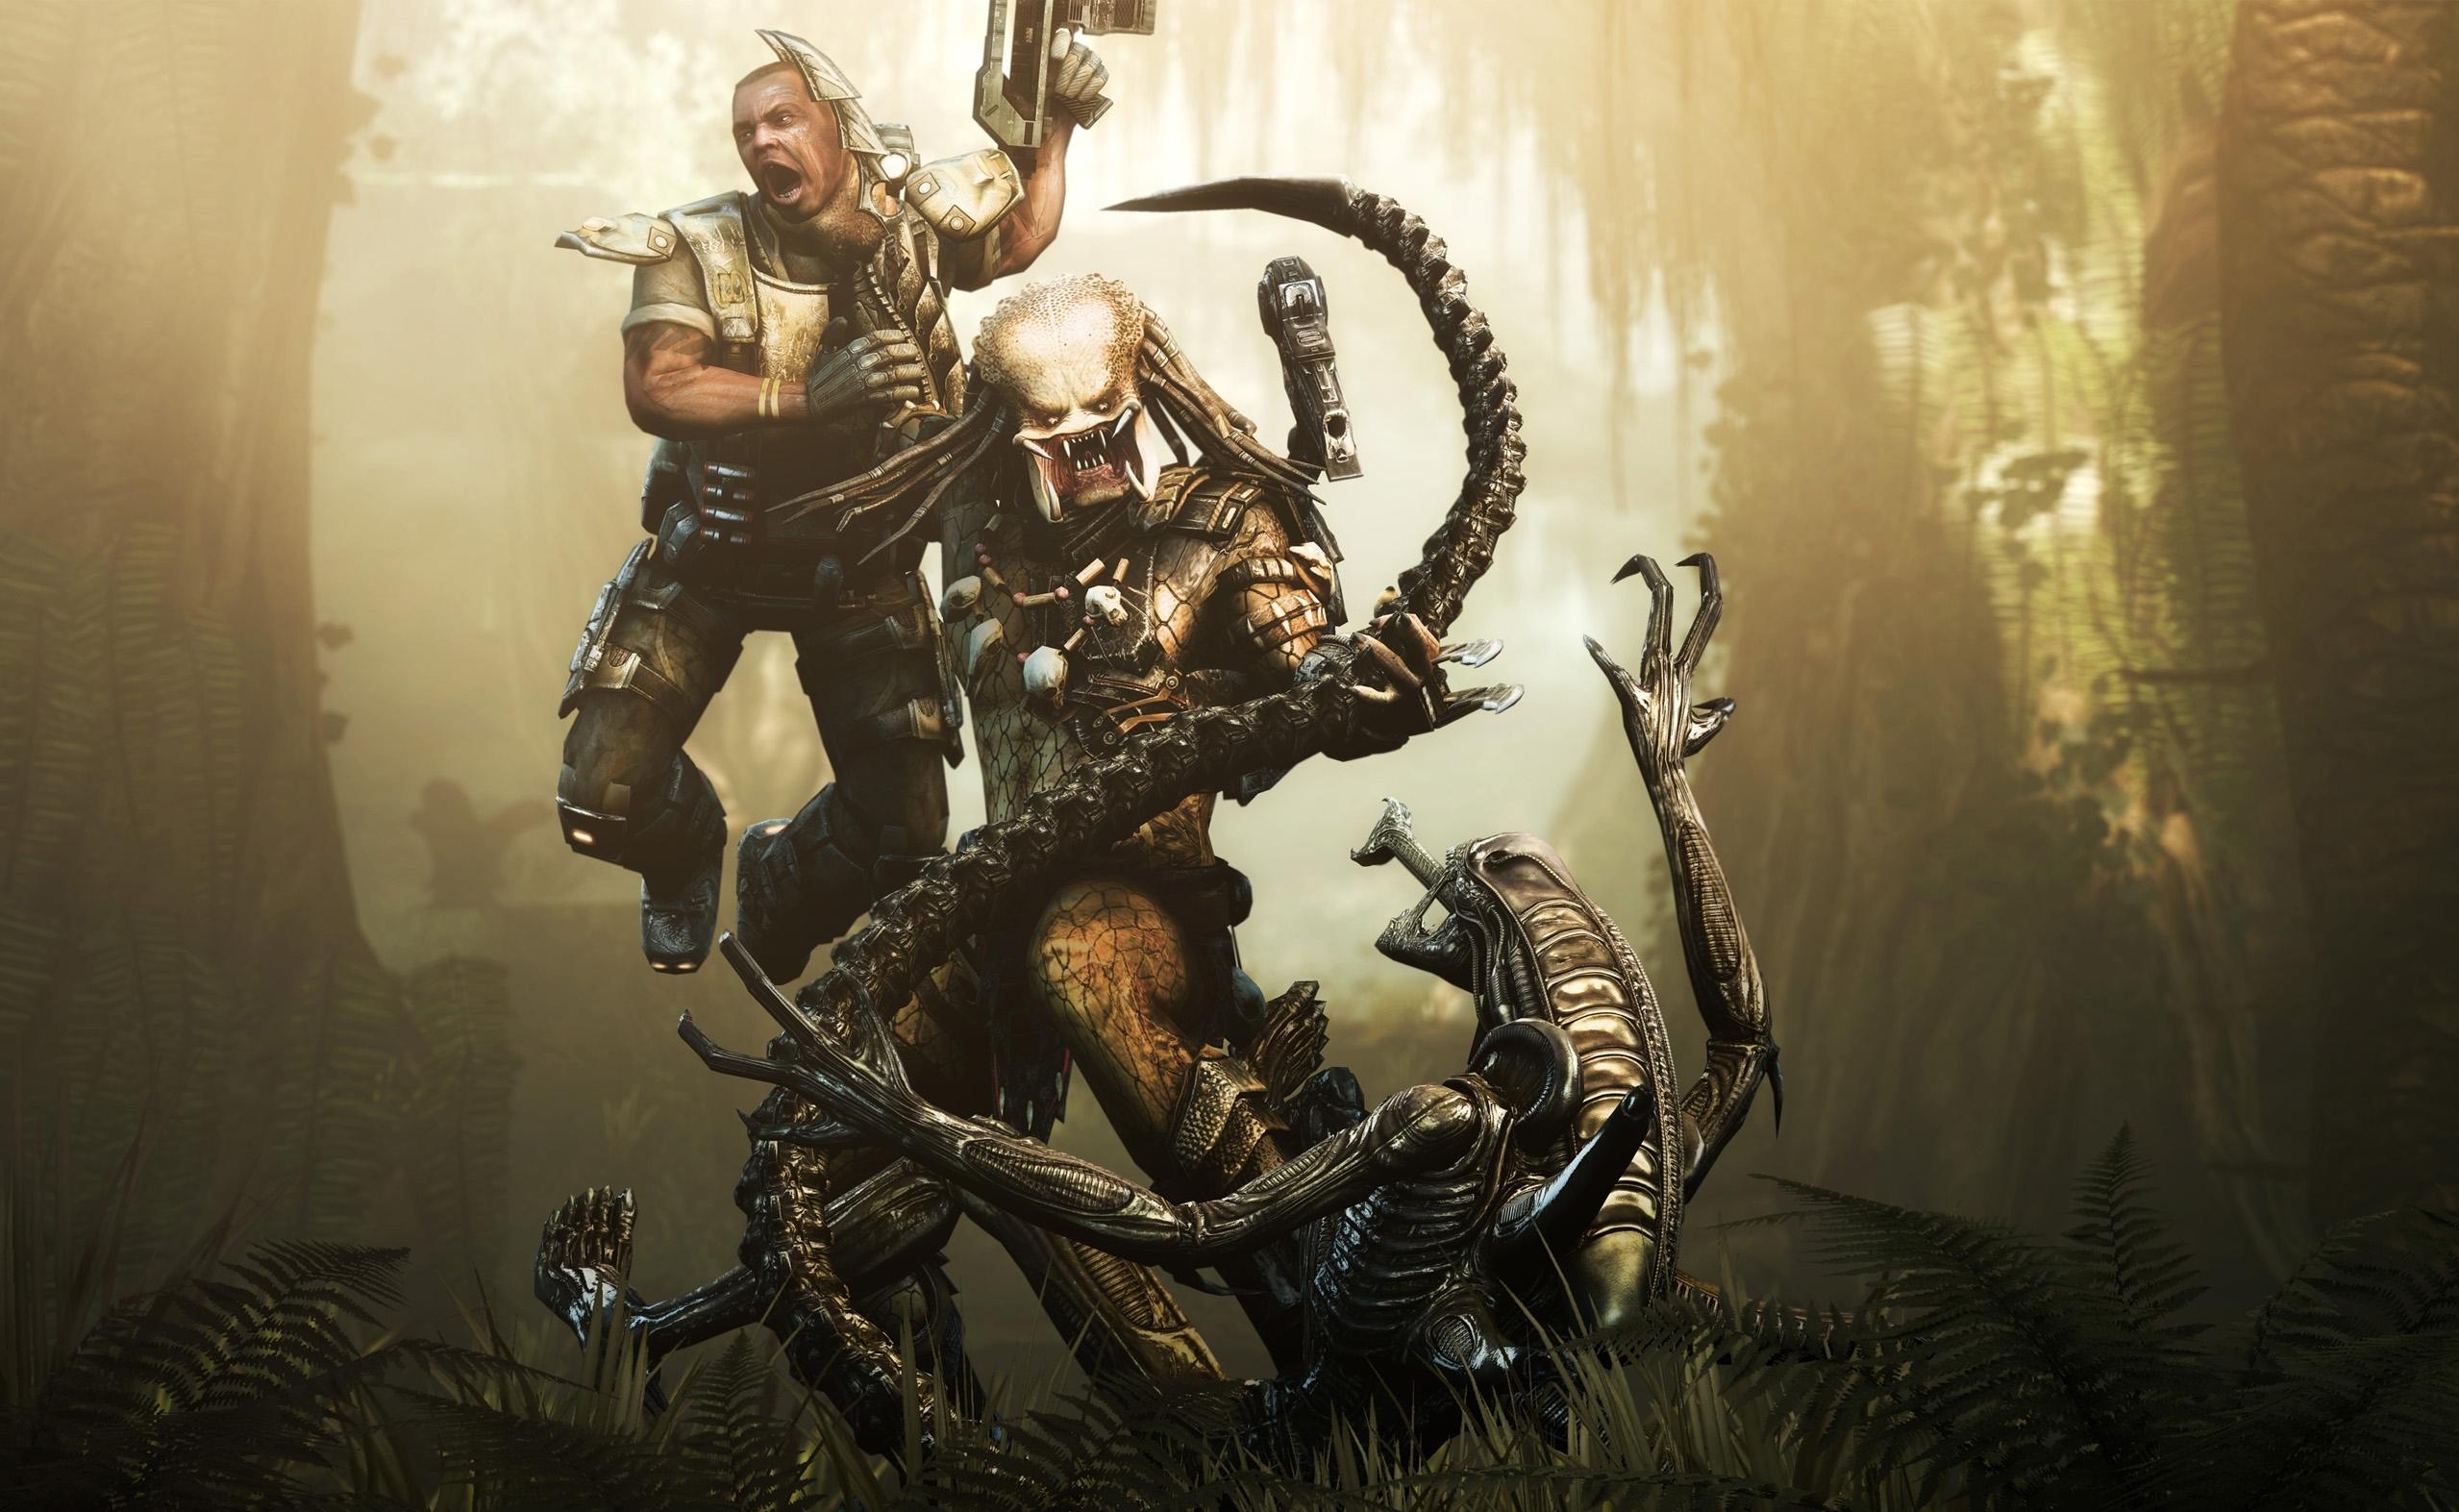 aliens vs. predator full hd fond d'écran and arrière-plan